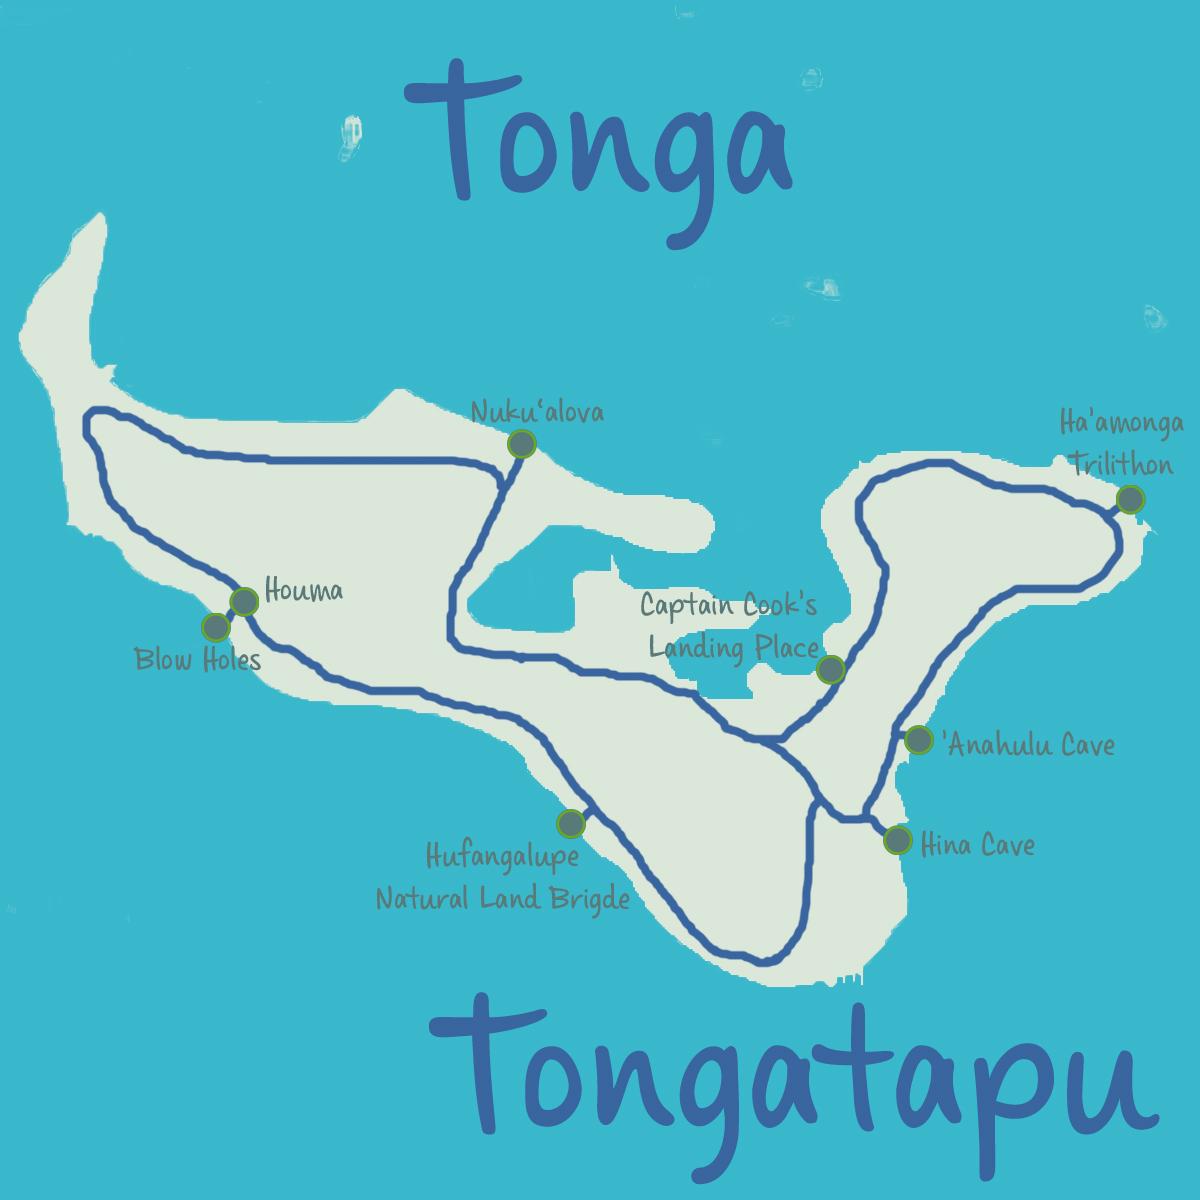 Tongatapu